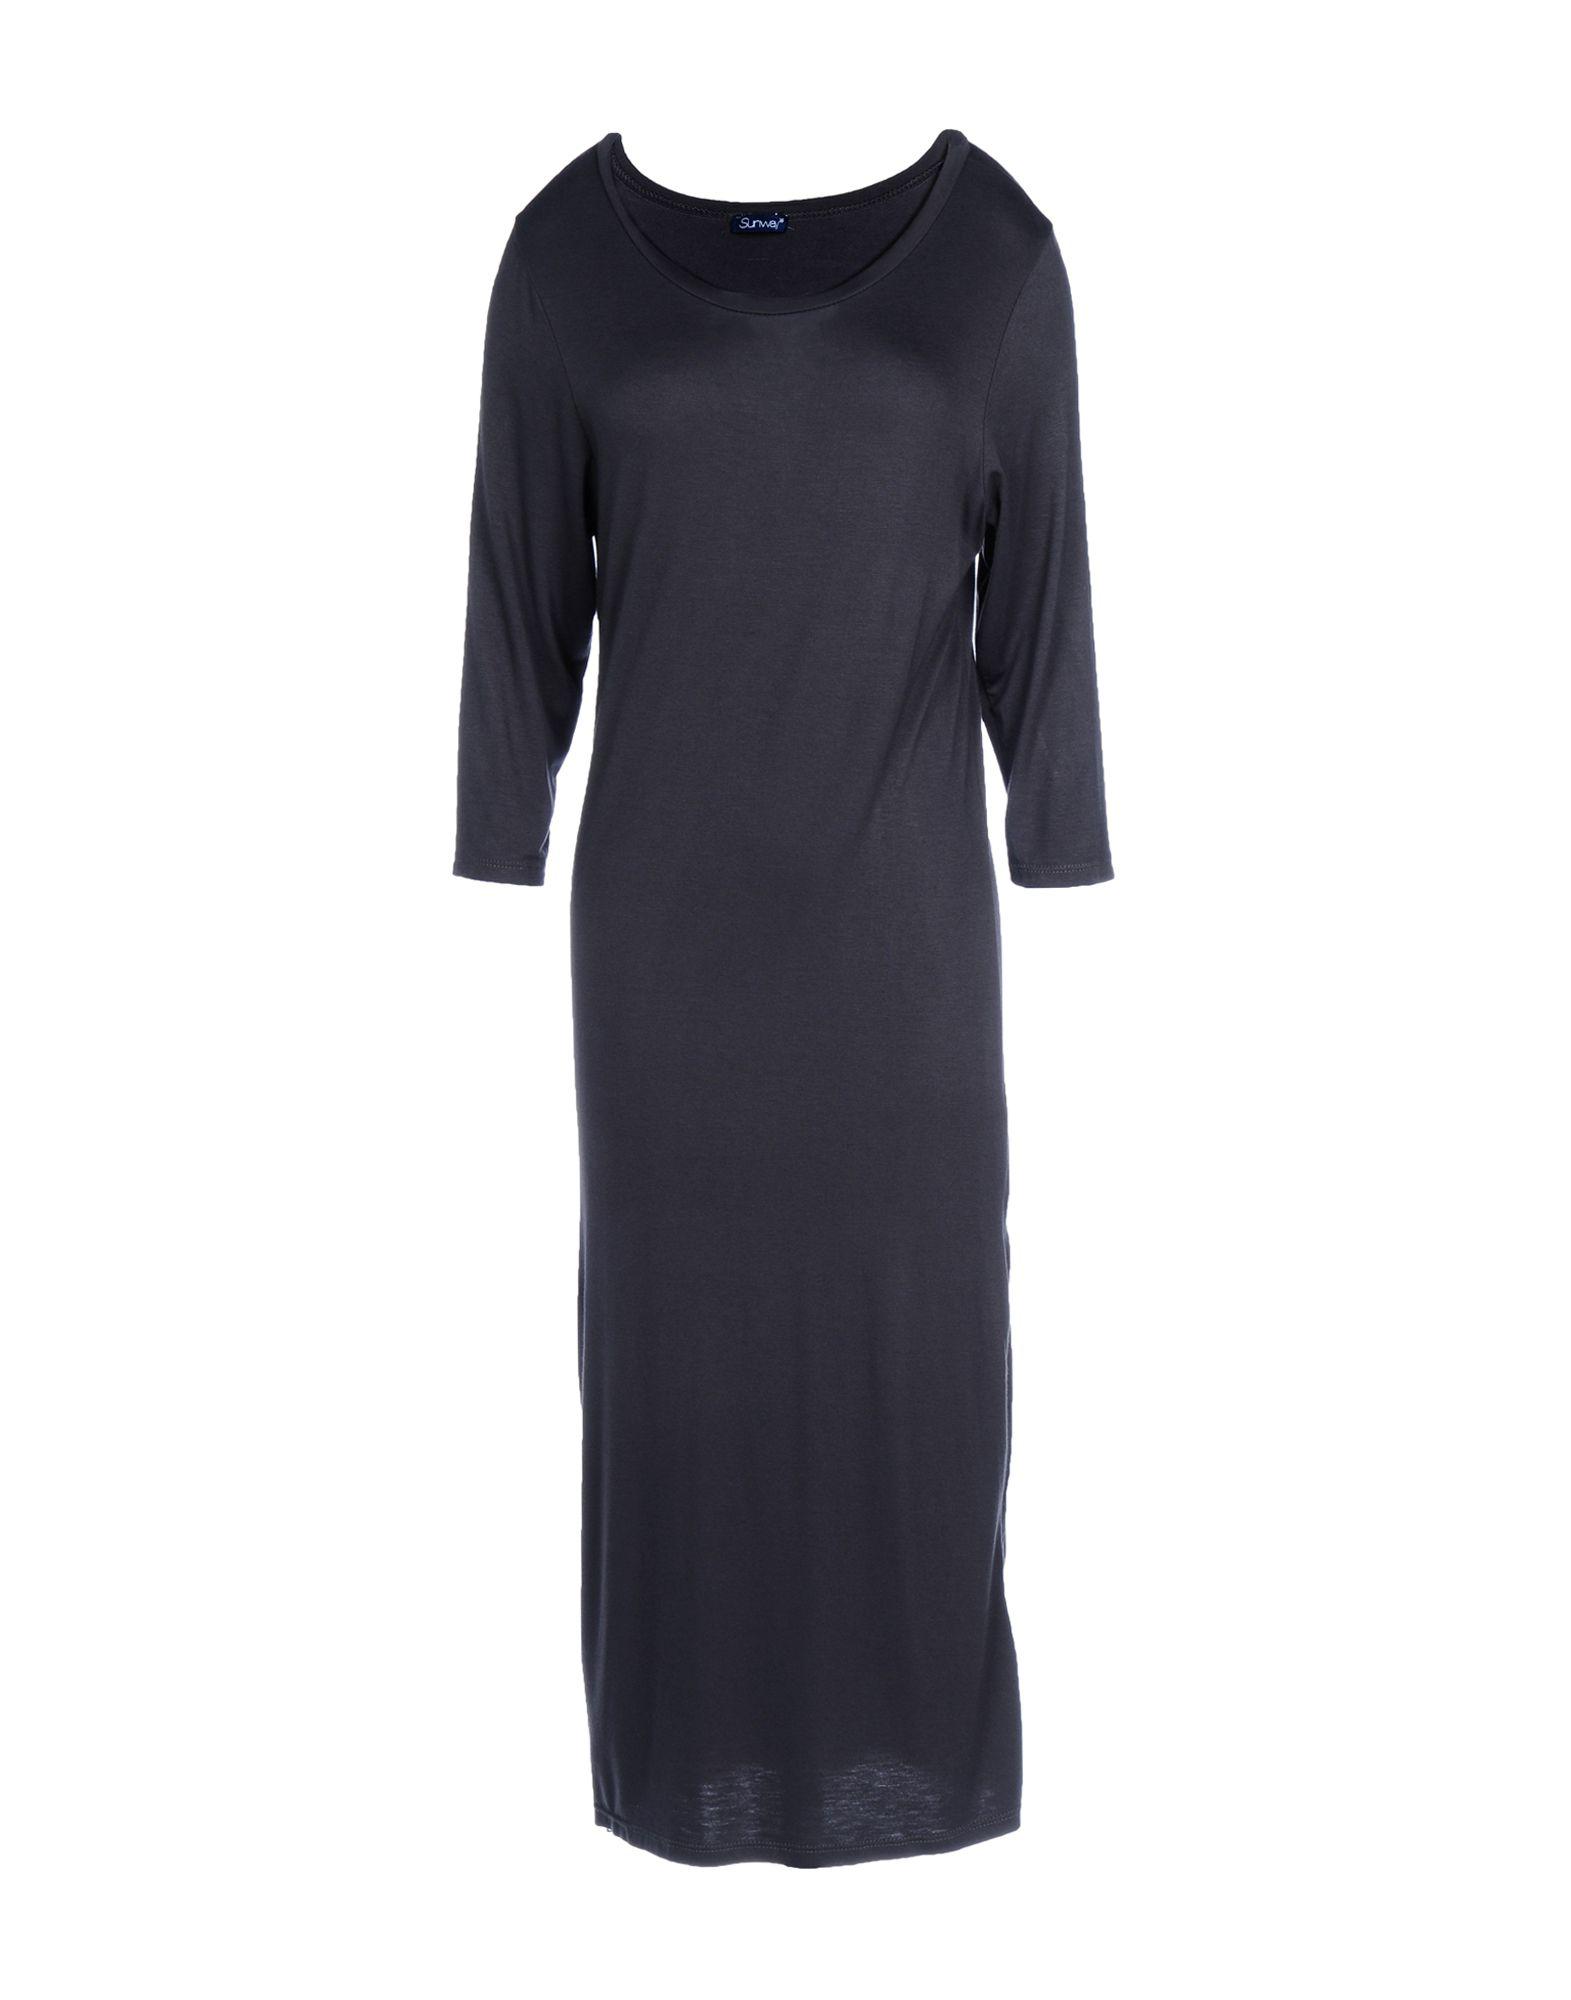 SUNWAY Платье длиной 3/4 lisa corti платье длиной 3 4